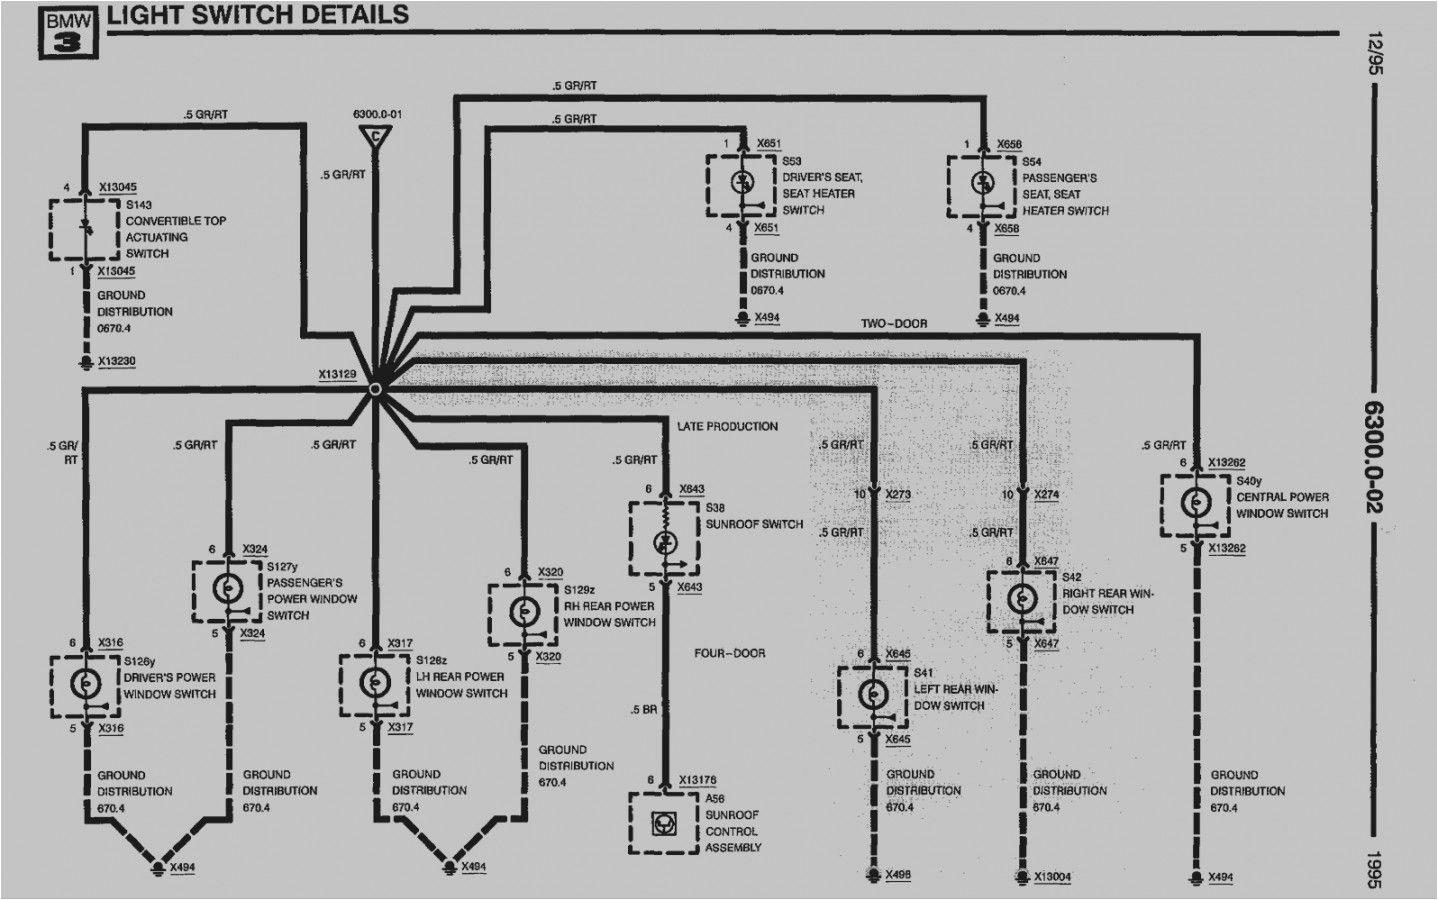 Bmw E36 Tail Light Wiring Diagram E36 Light Wiring Diagram Wiring Diagram Host